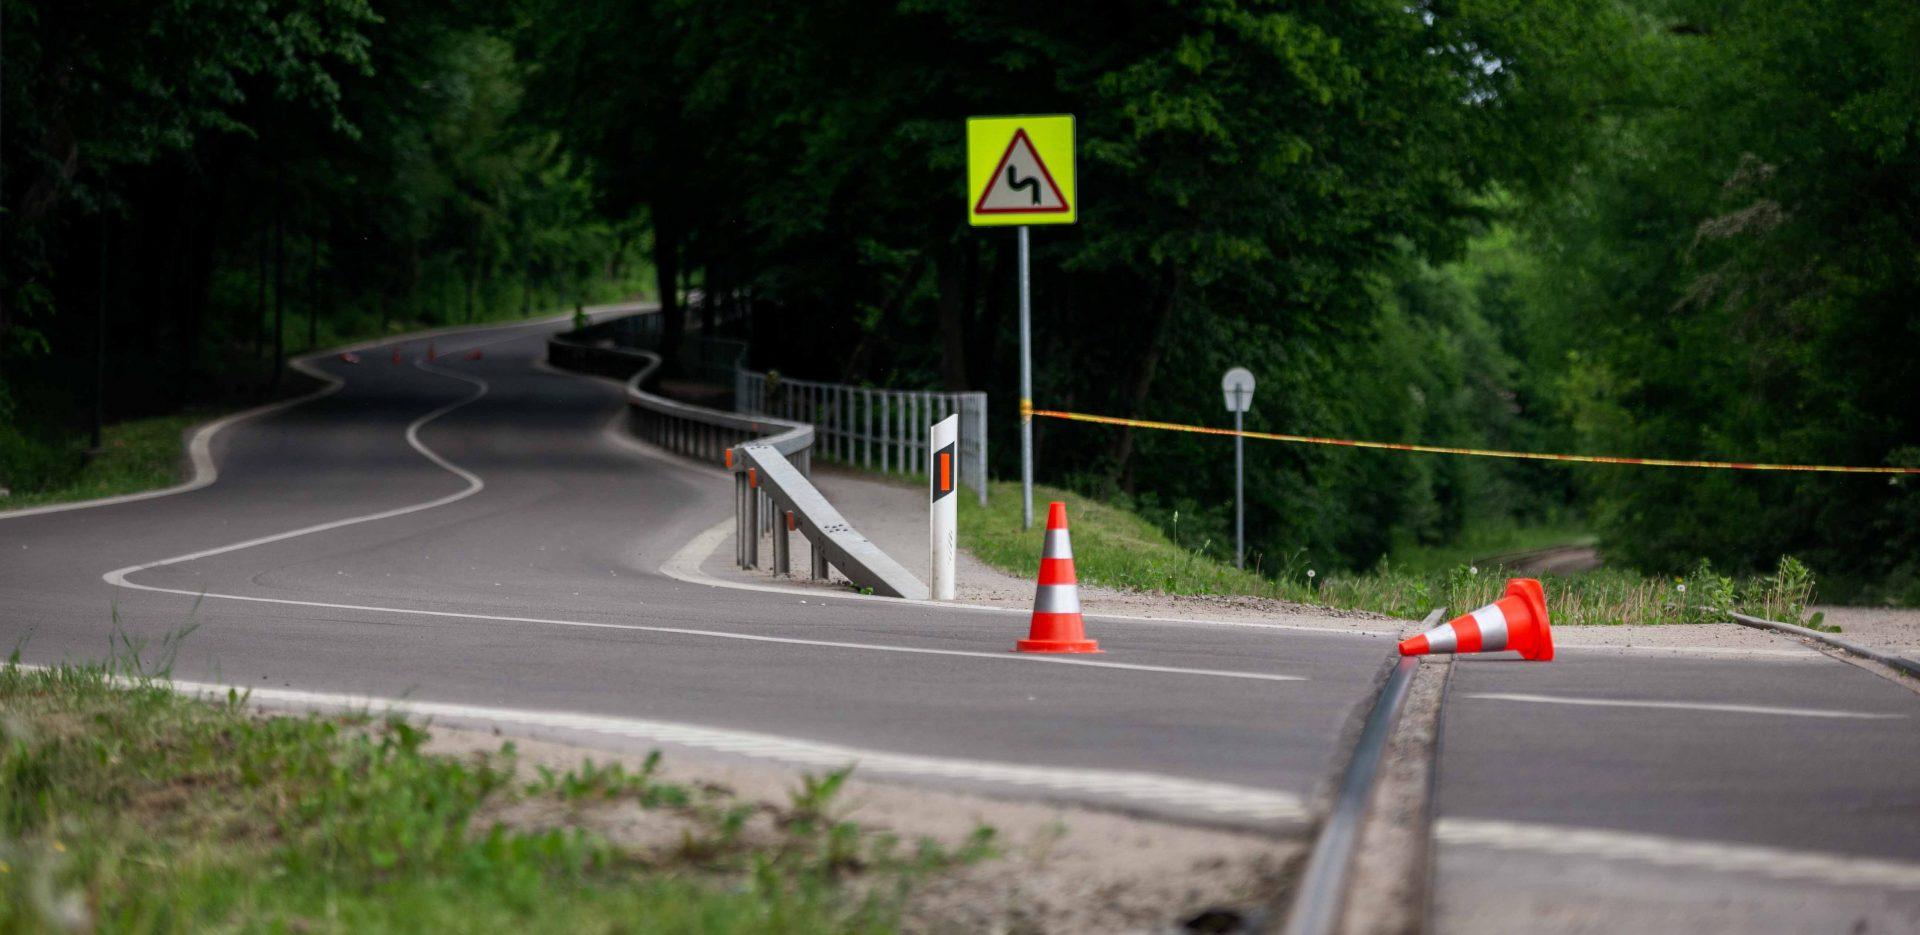 Kauno Autoklubas | Drive hard. Get dirty. Have fun.